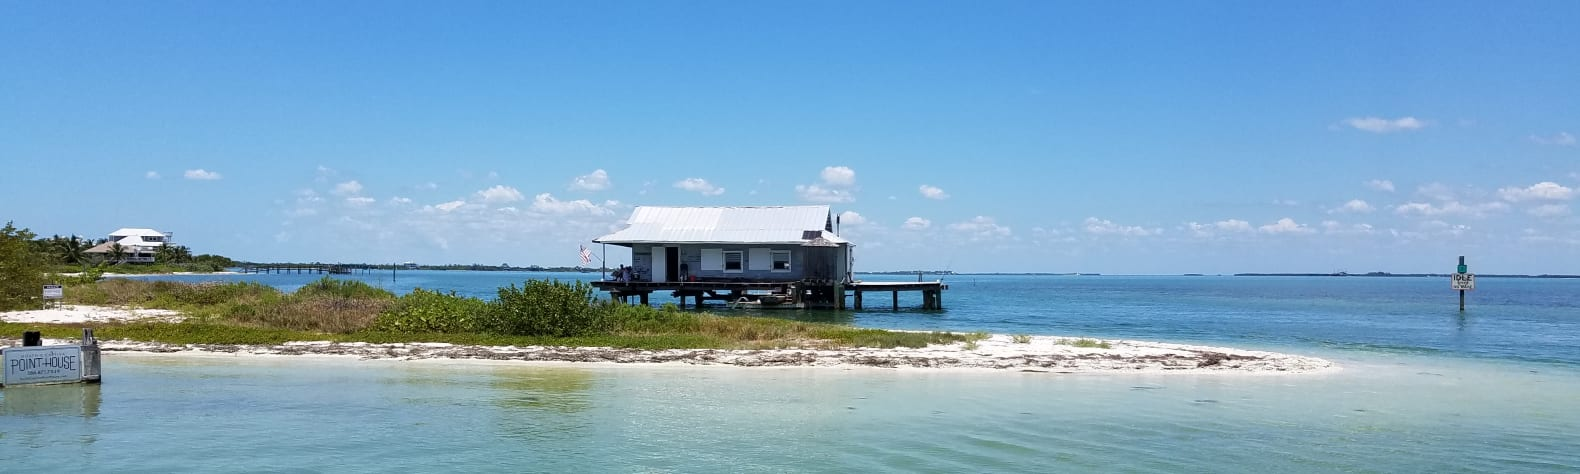 Barrier island retreat